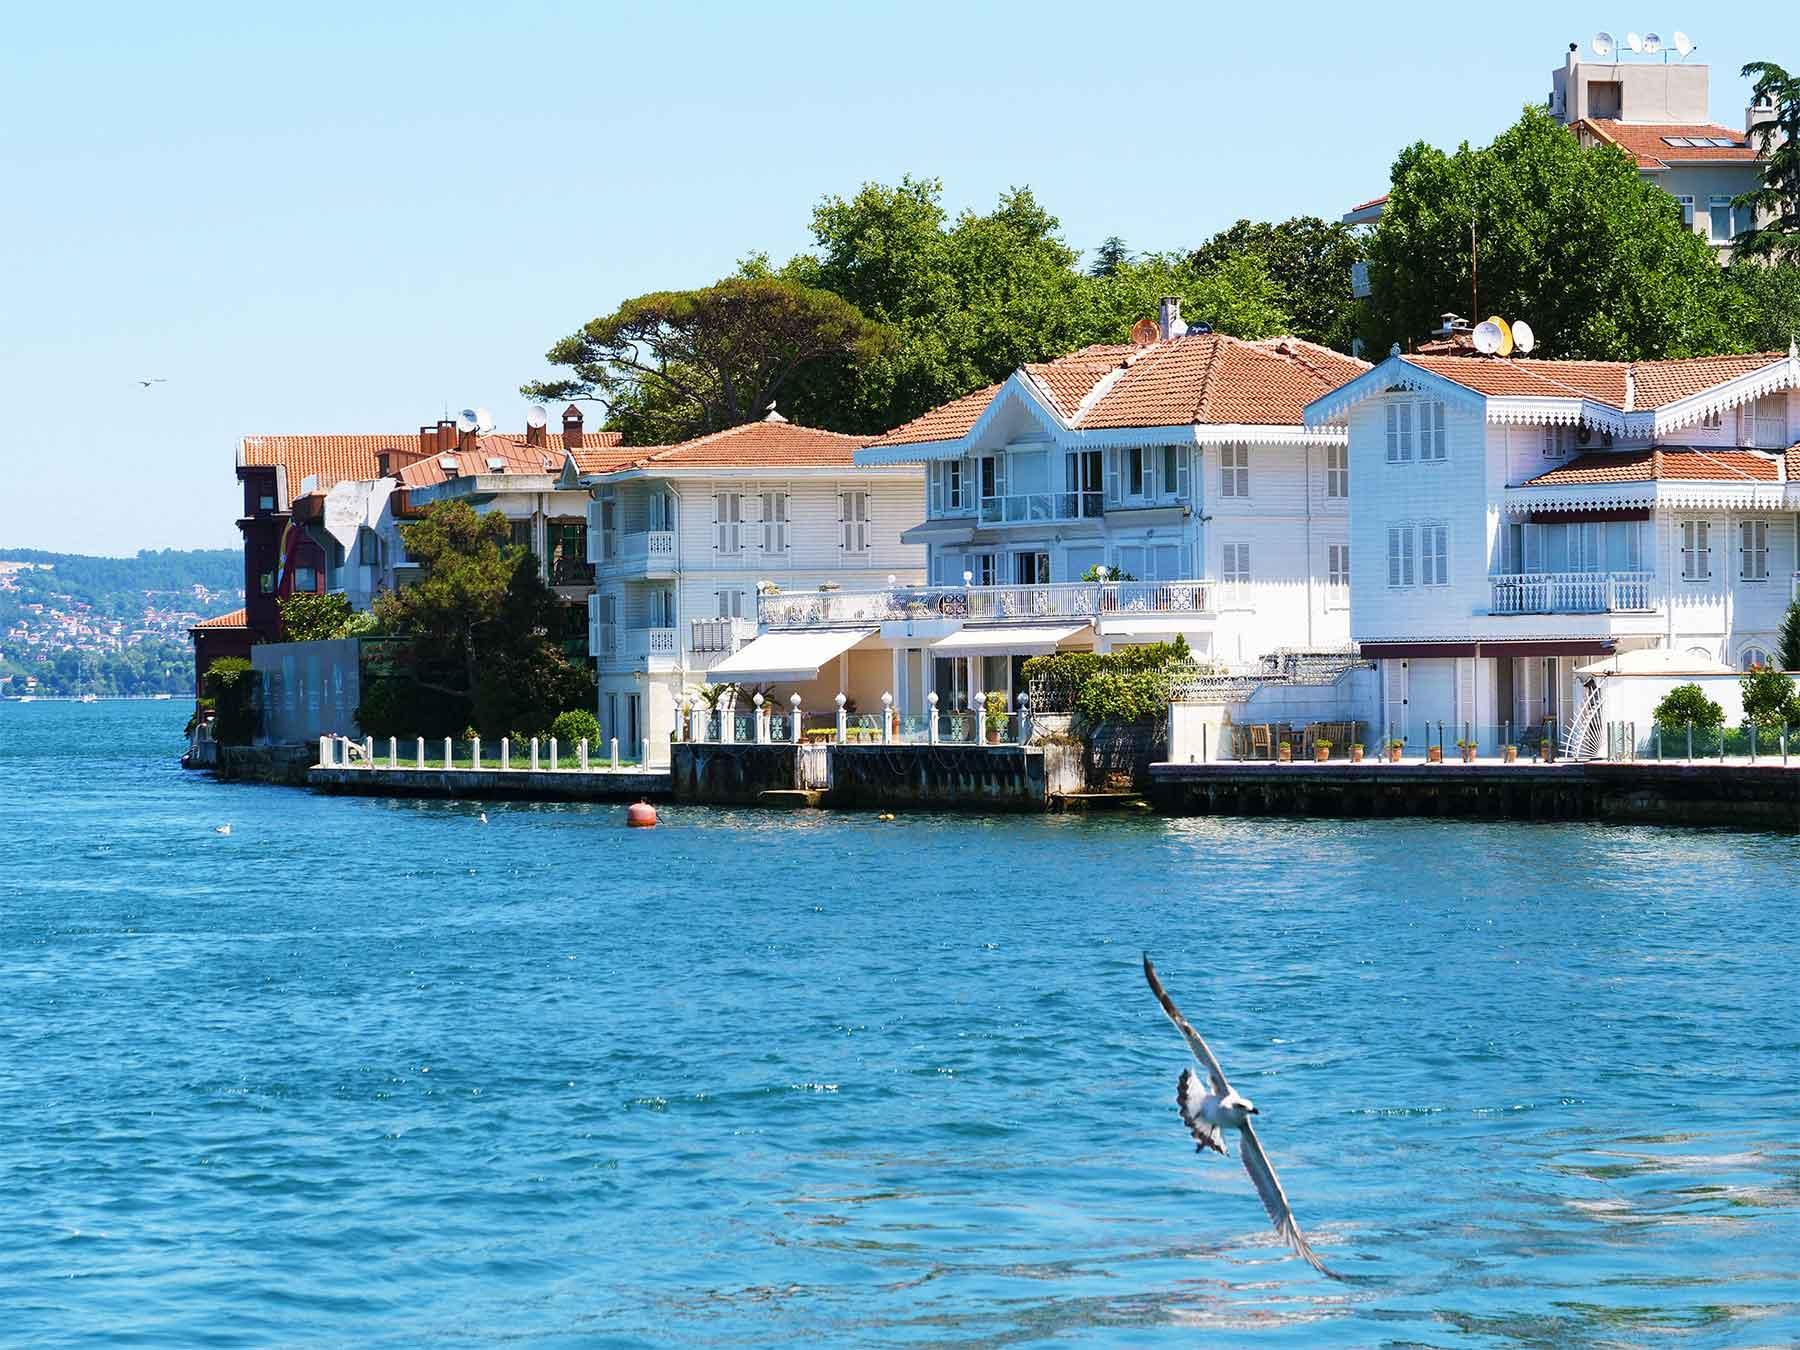 Bosphorus Coastal Residences Istanbul Turkey | Dr Steven Andrew Martin 2019 Research